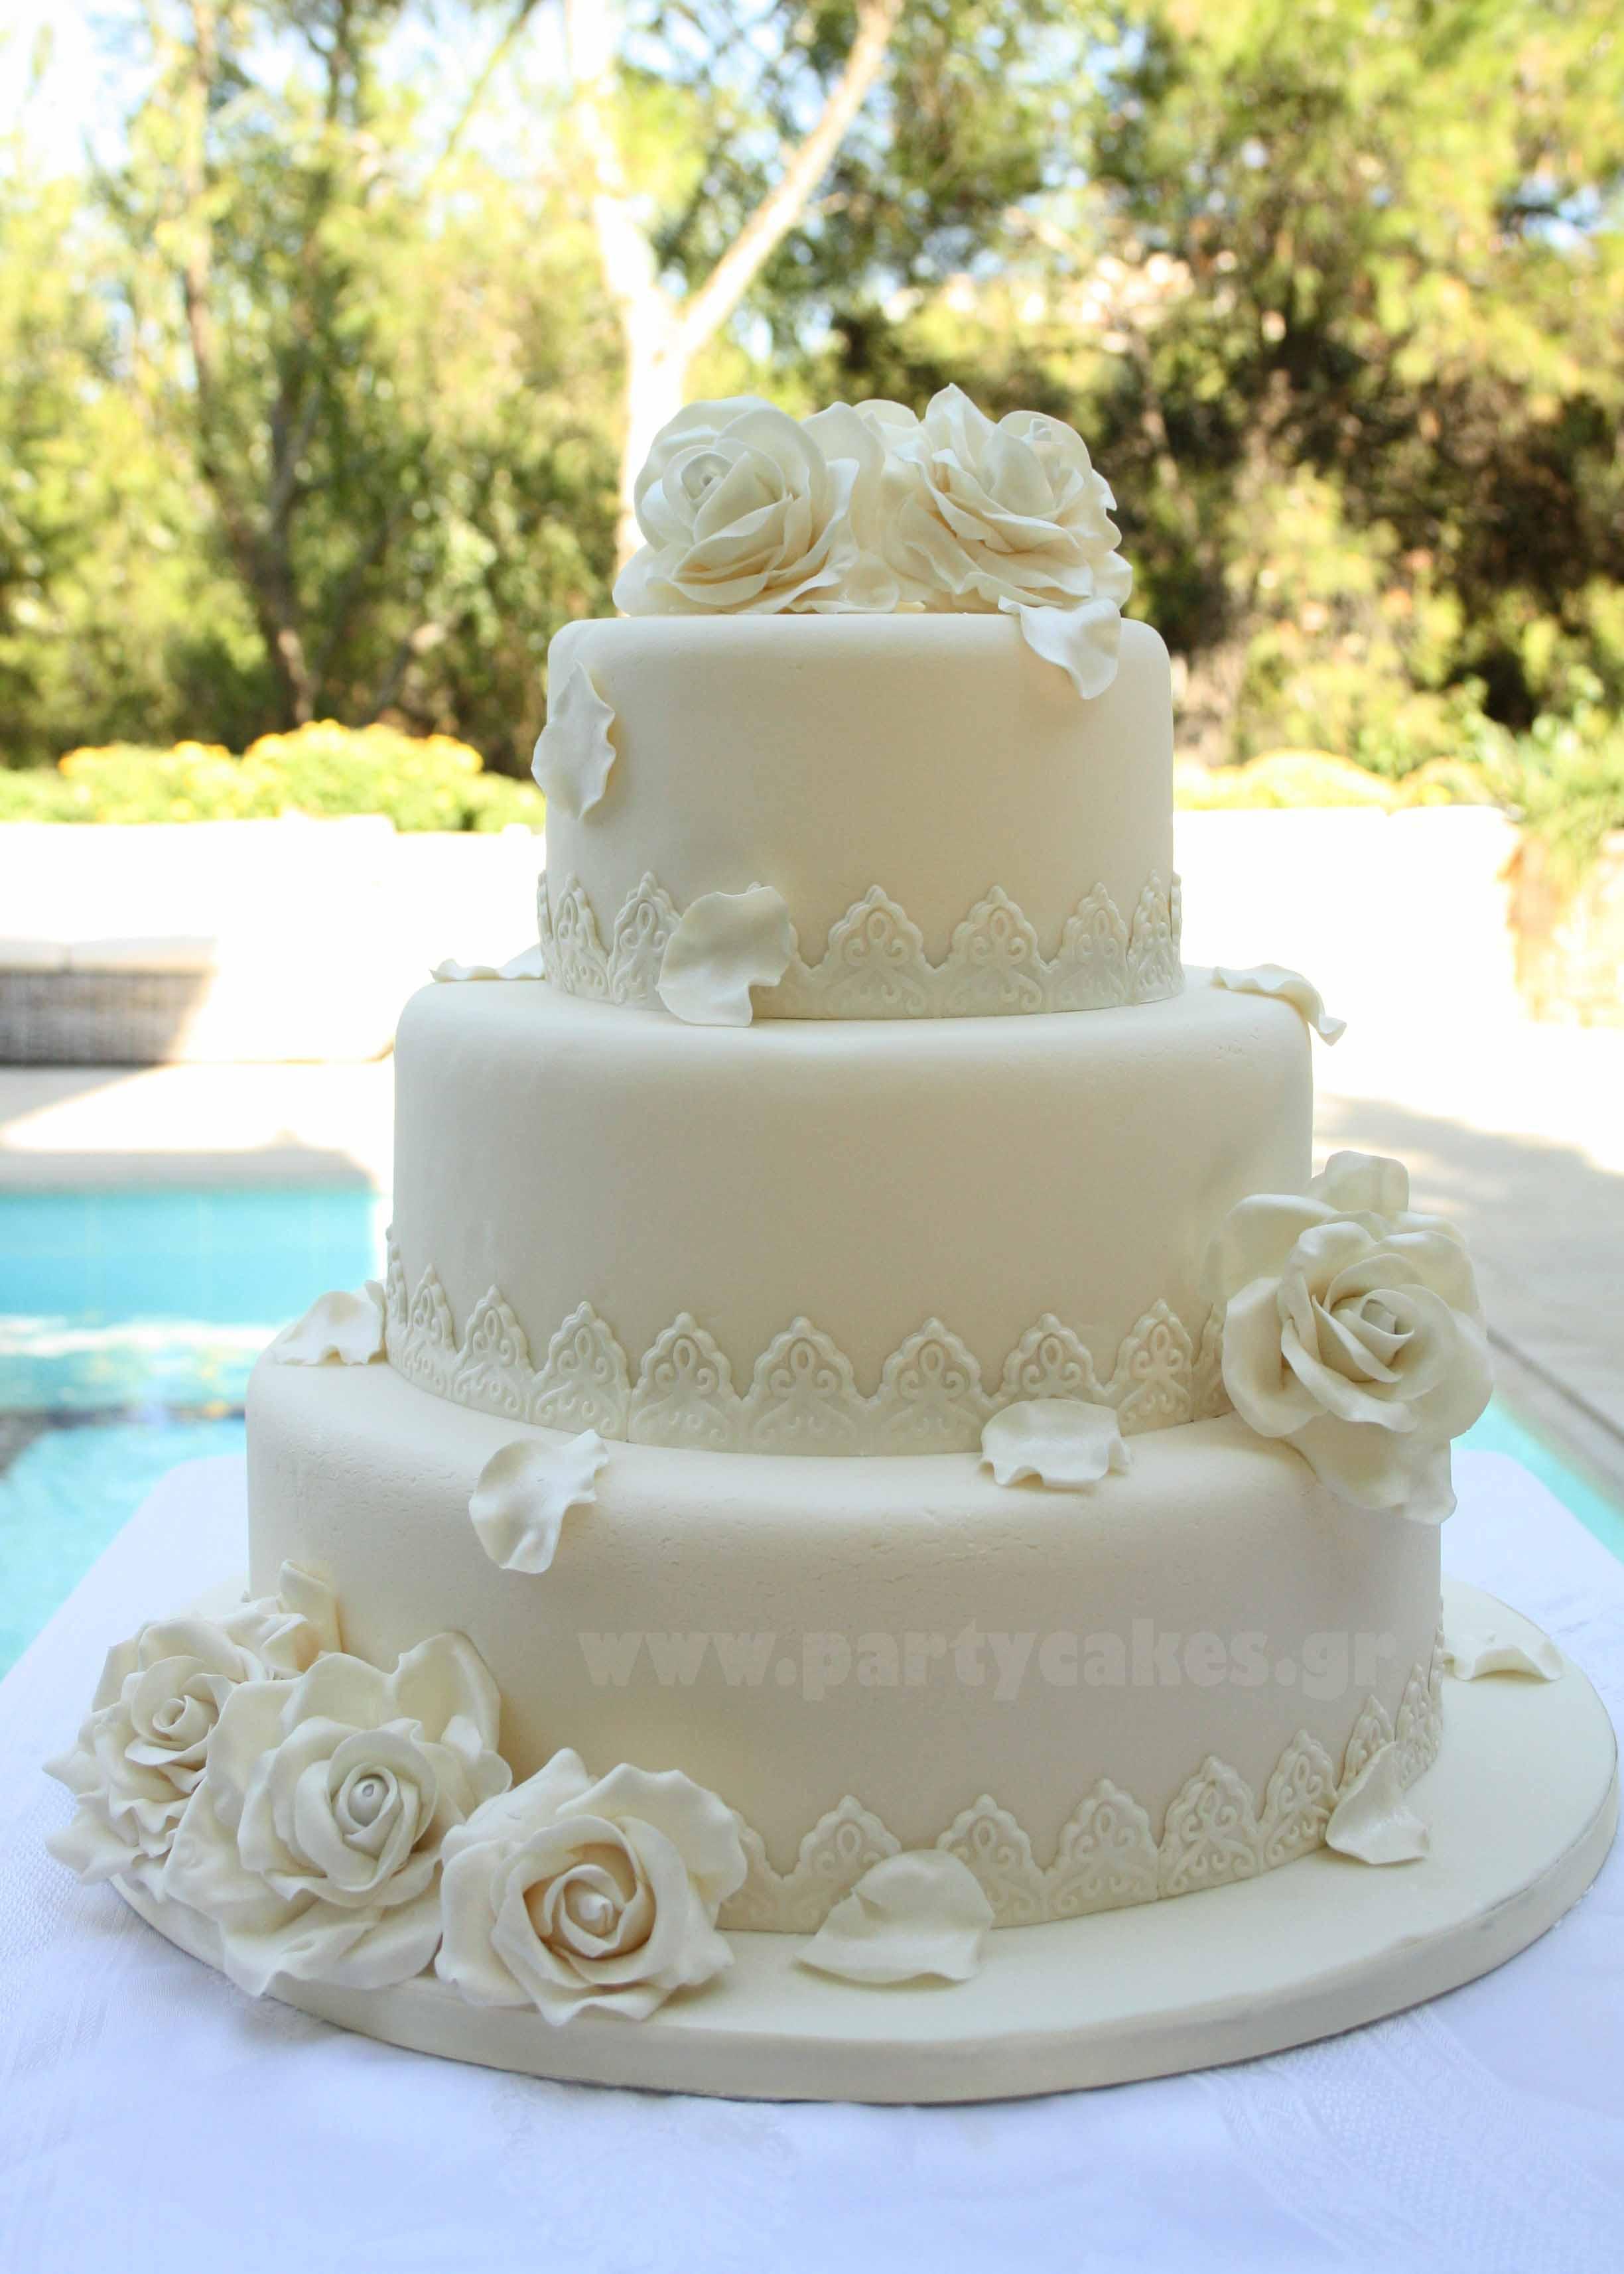 Wedding+cake+roses+1+copy.jpg